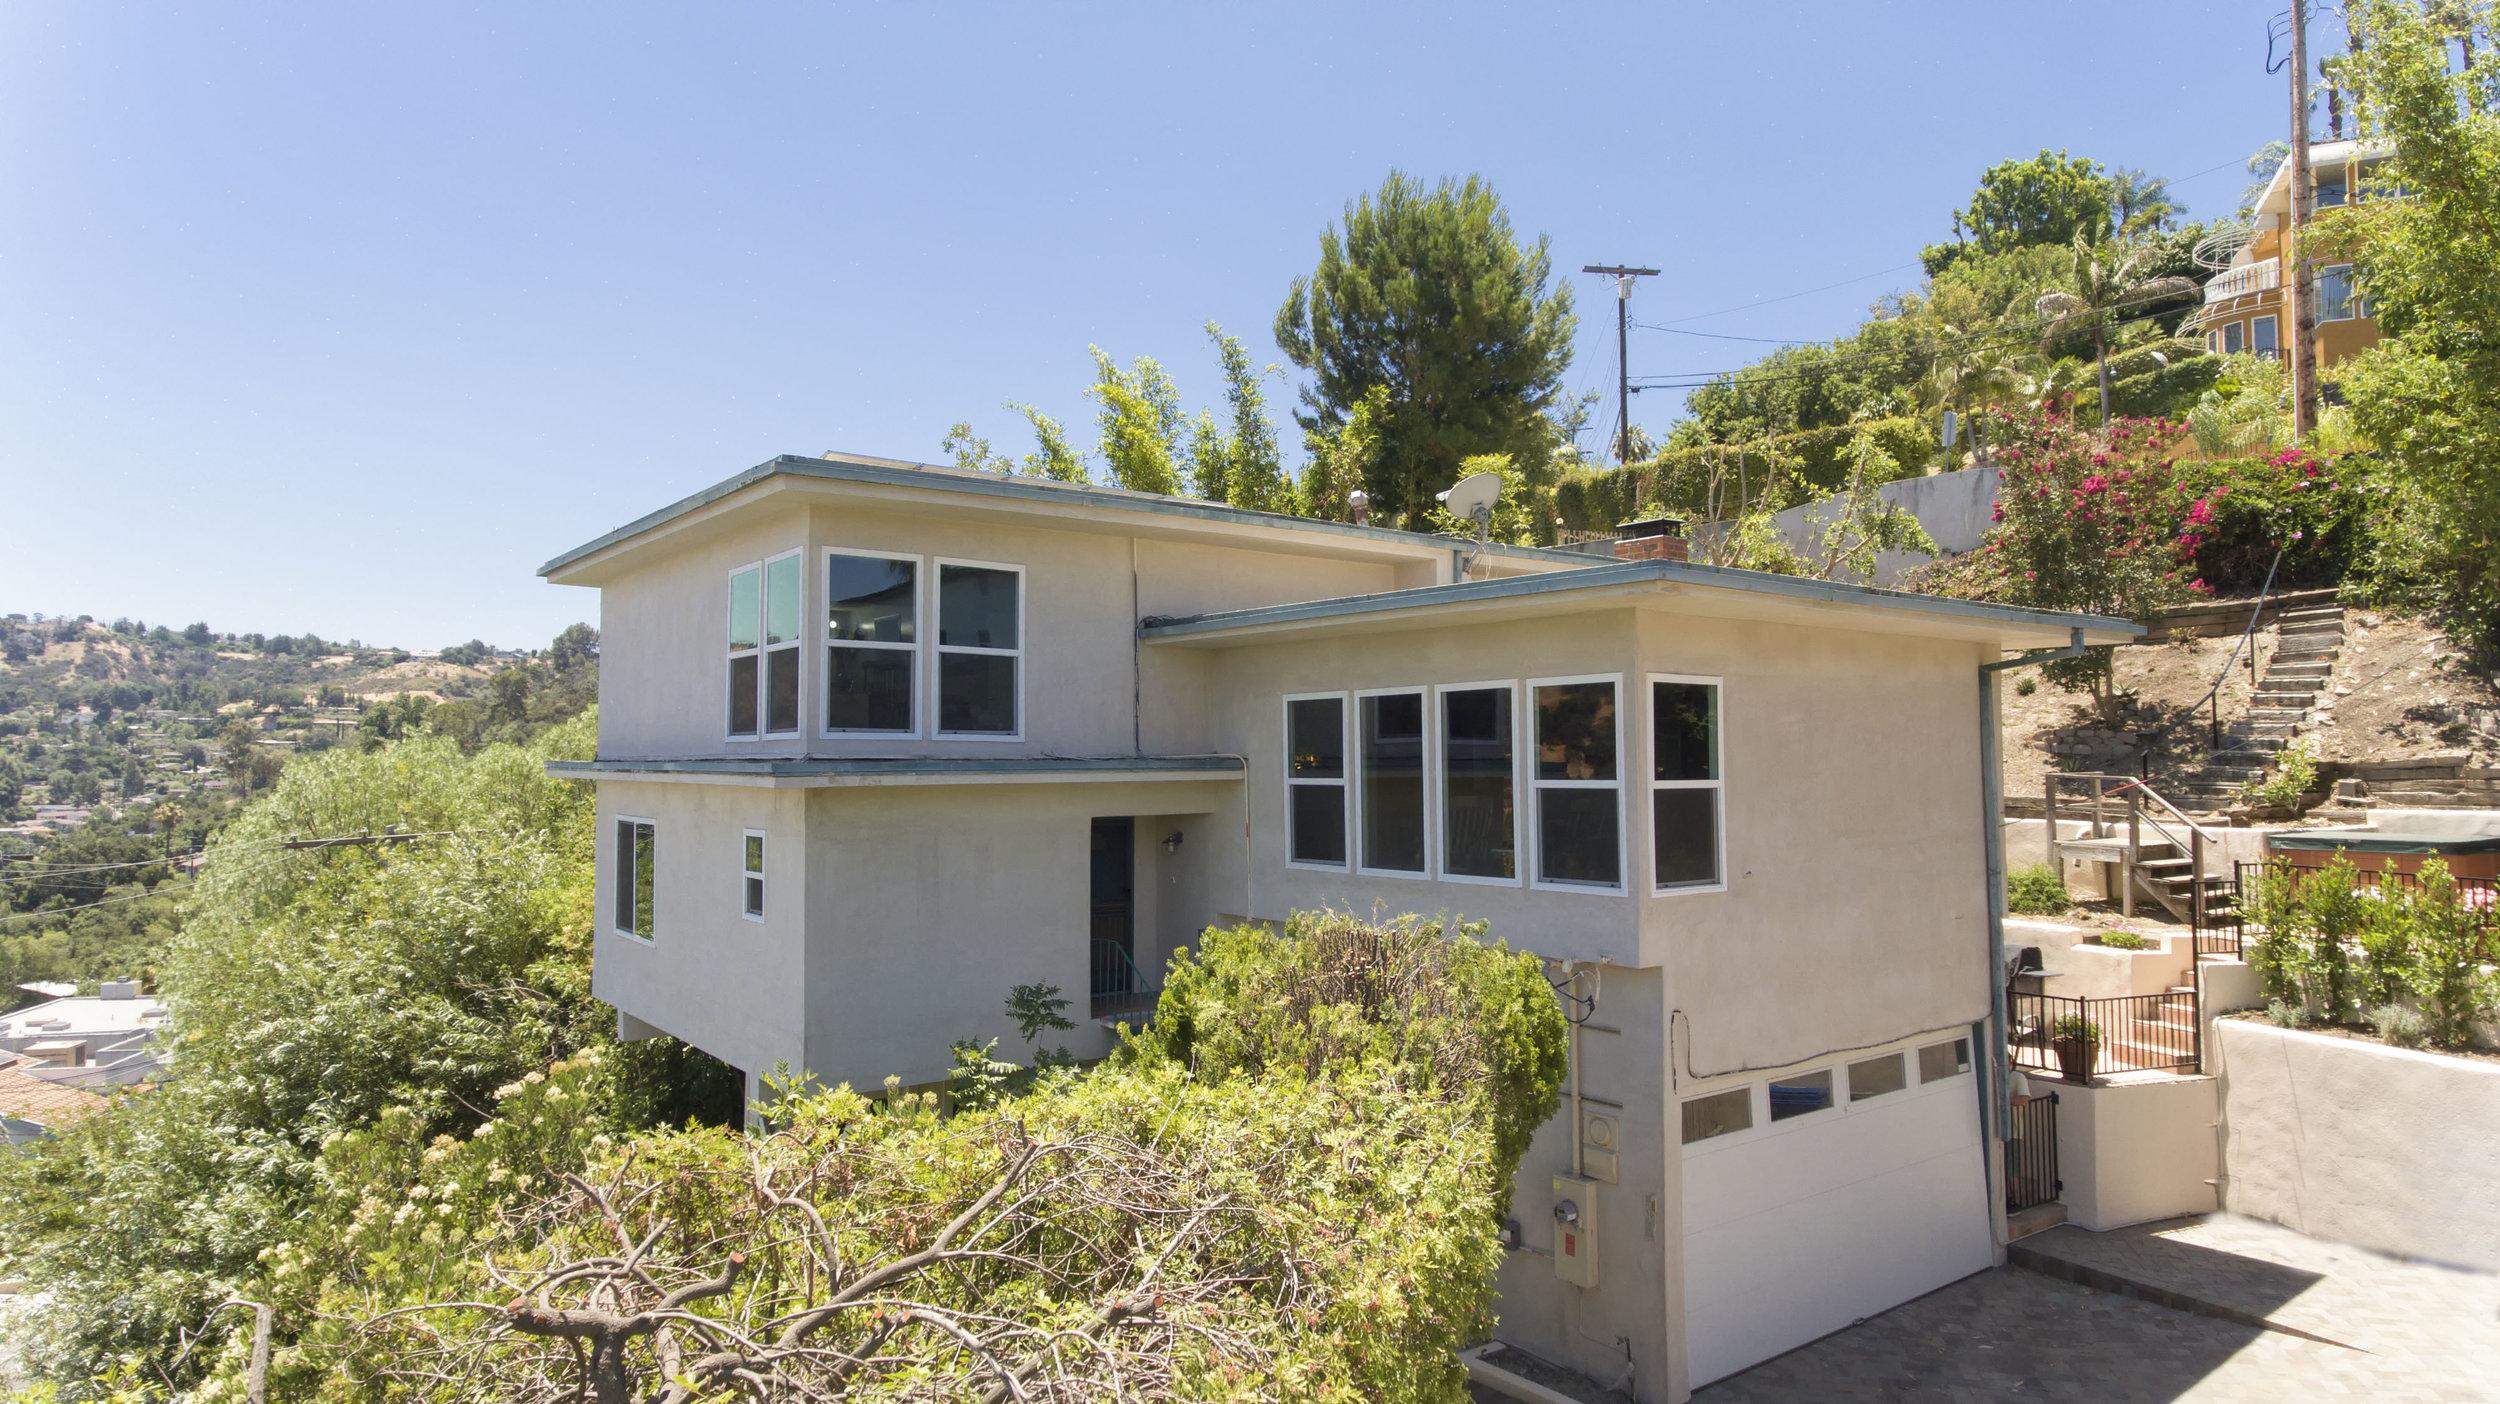 001 Exterior 15072 Rayneta Sherman Oaks For Sale The Malibu Life Team Luxury Real Estate.jpg